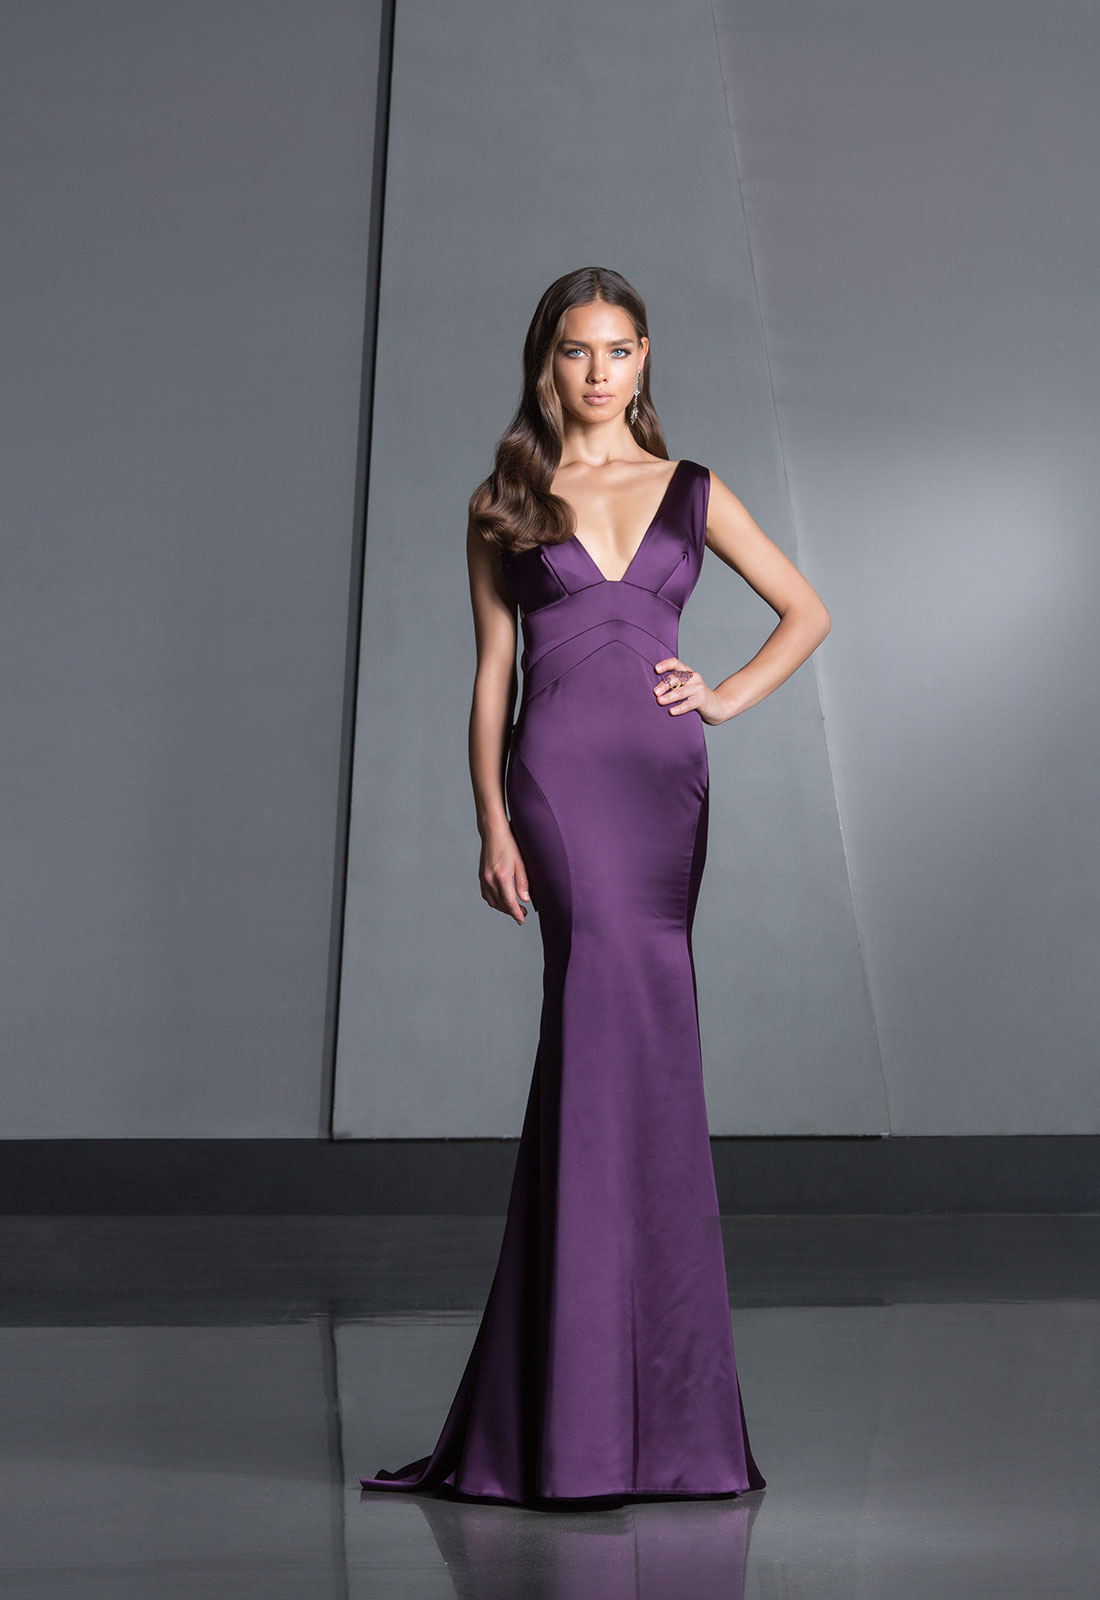 Encantador Vestidos De Fin De Fiesta En Línea Modelo - Vestido de ...